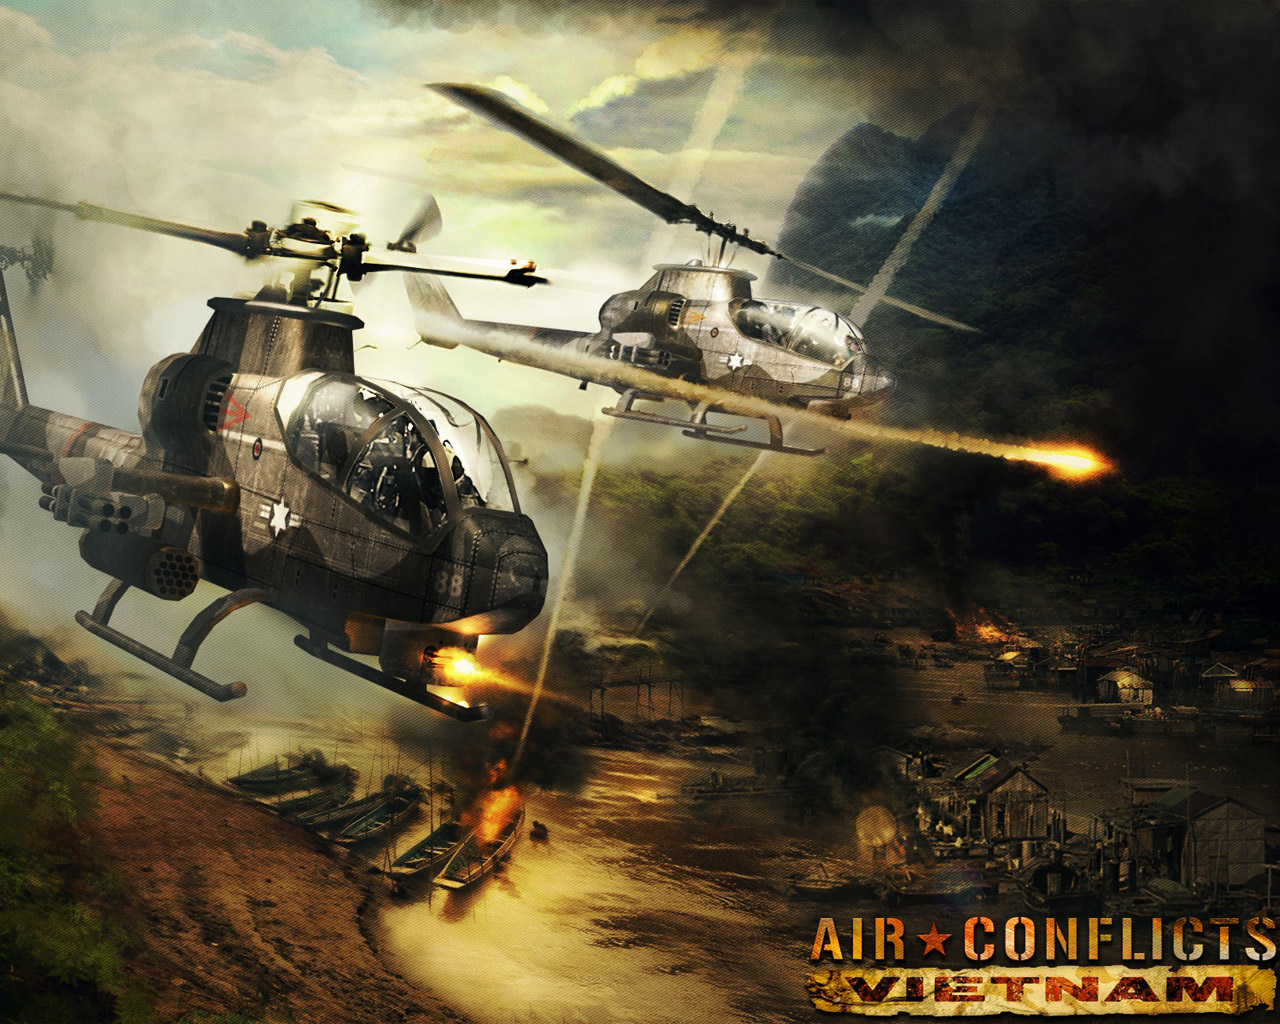 Air Conflicts: Vietnam Wallpaper in 1280x1024